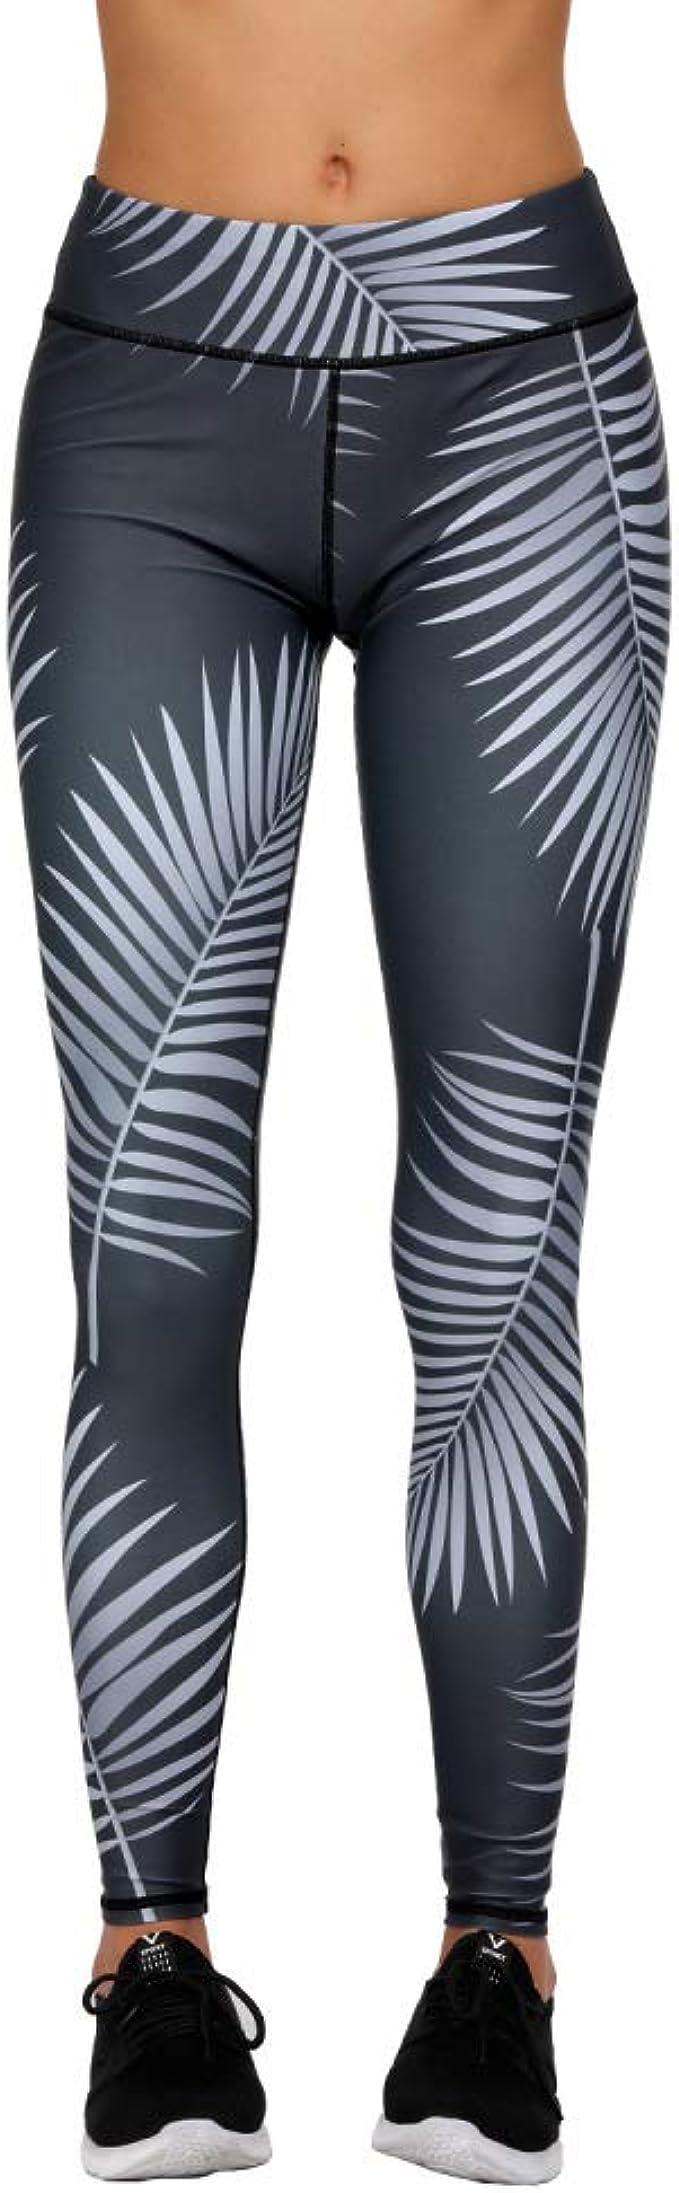 nonbranded Leggings de mujer New Leaf Print Pantalones pitillo de ...